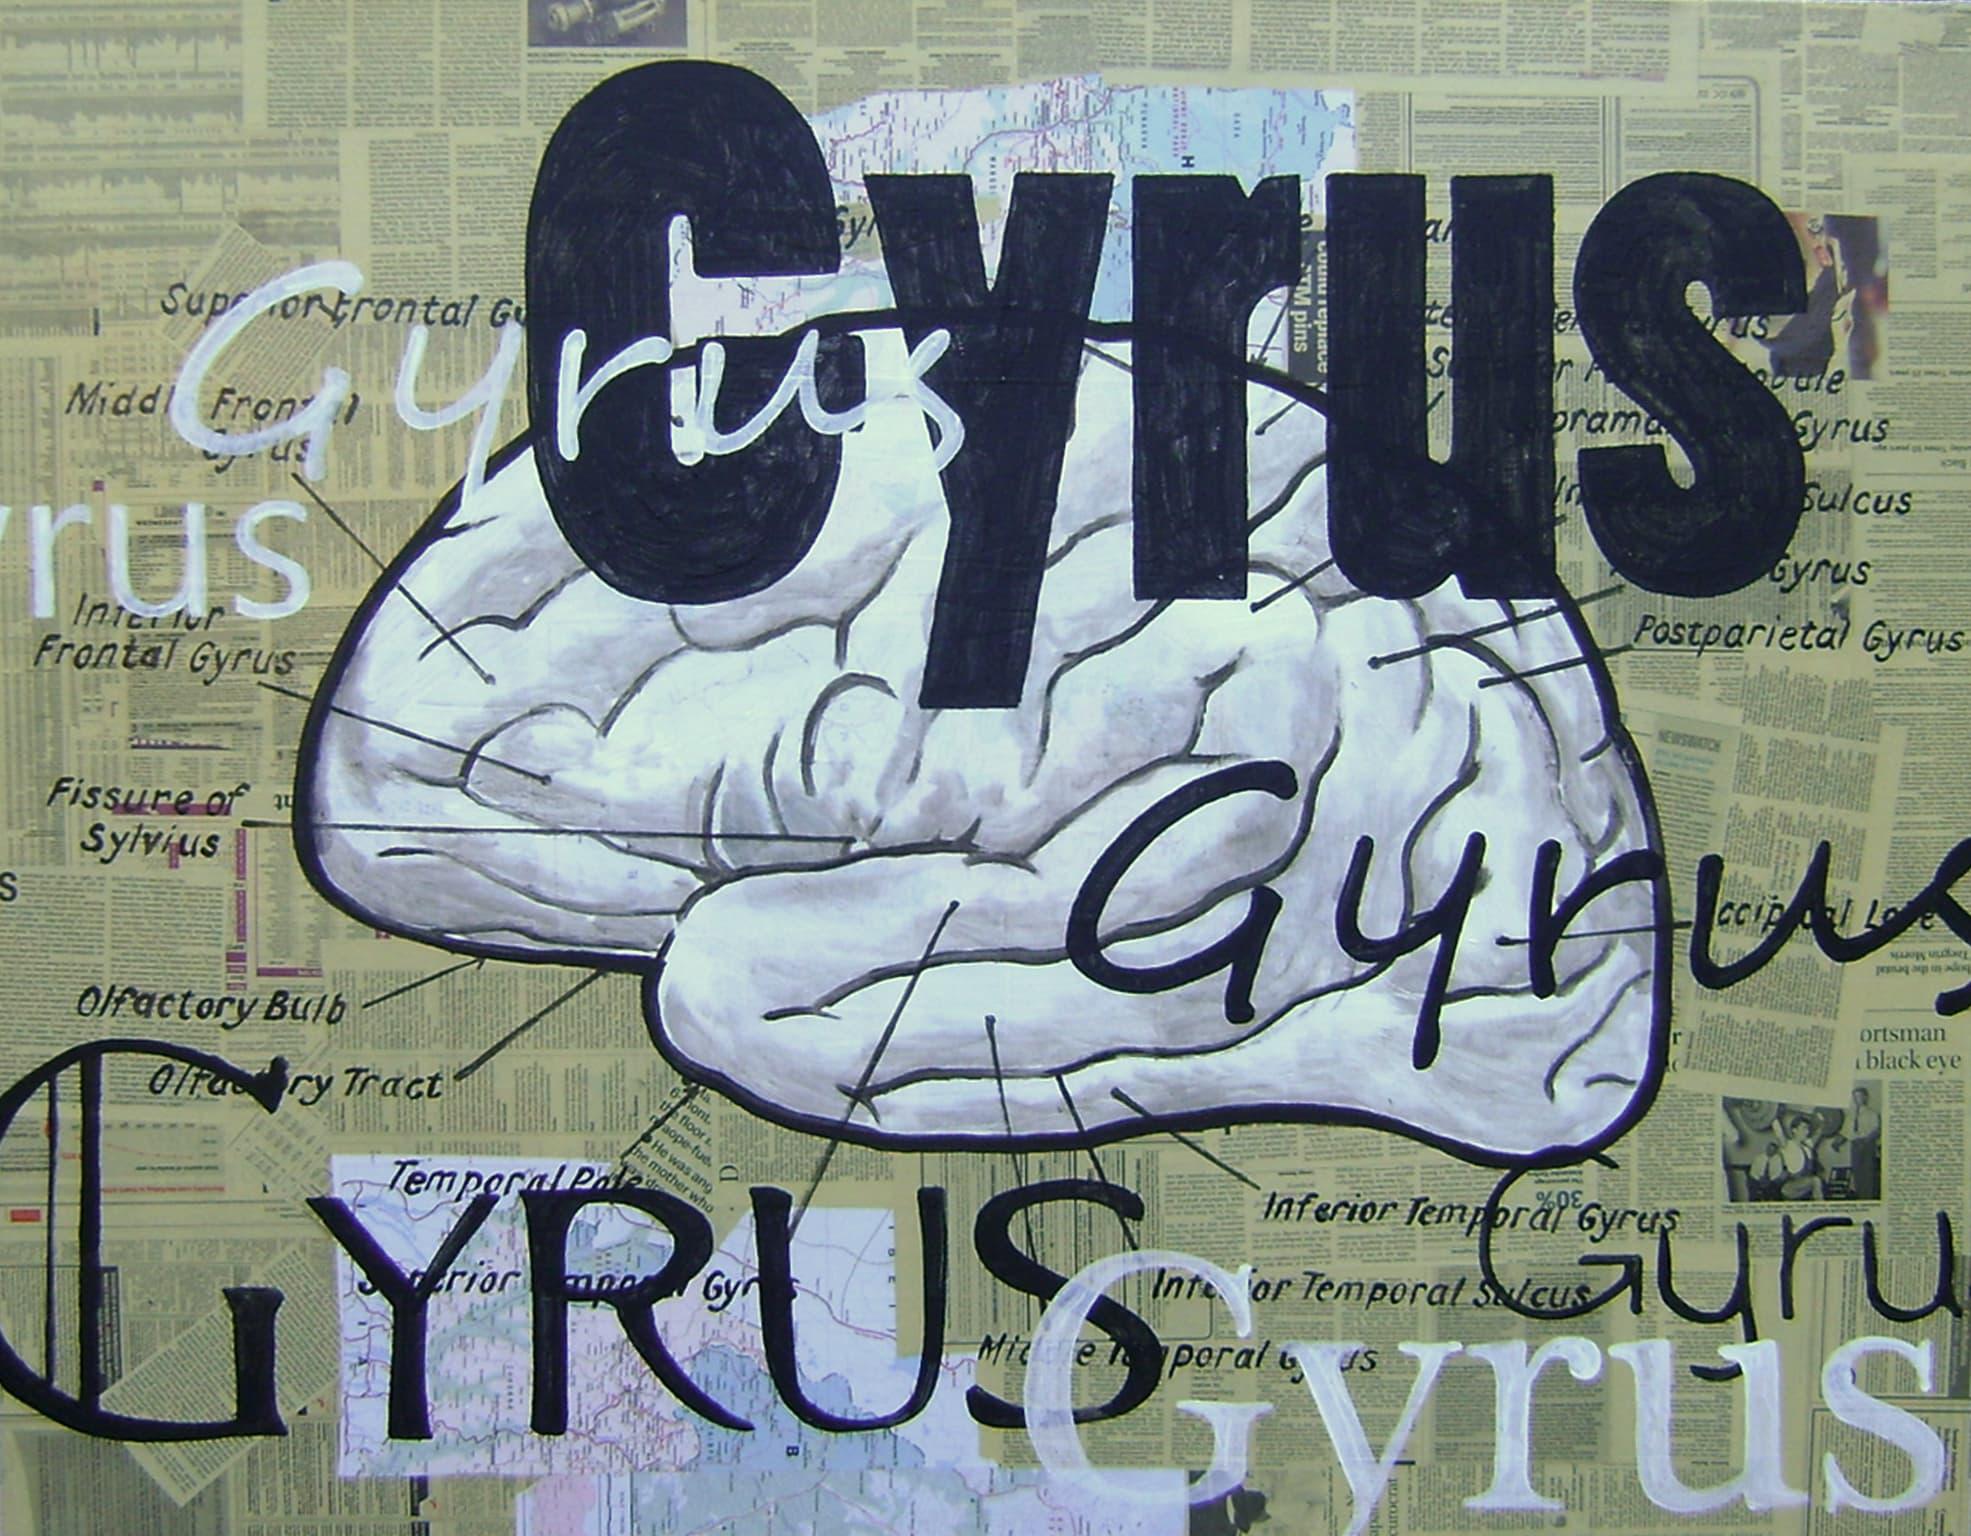 <span class=&#34;link fancybox-details-link&#34;><a href=&#34;/artists/73-sascha-%26-tashi-stylianou/works/3067-sascha-tashi-stylianou-gyrus-2015/&#34;>View Detail Page</a></span><div class=&#34;artist&#34;><strong>Sascha & Tashi Stylianou</strong></div> <div class=&#34;title&#34;><em>Gyrus</em>, 2015</div> <div class=&#34;medium&#34;>Mixed Media On Canvas</div> <div class=&#34;dimensions&#34;>101.5cm x 128cm</div><div class=&#34;price&#34;>R12,500.00</div>